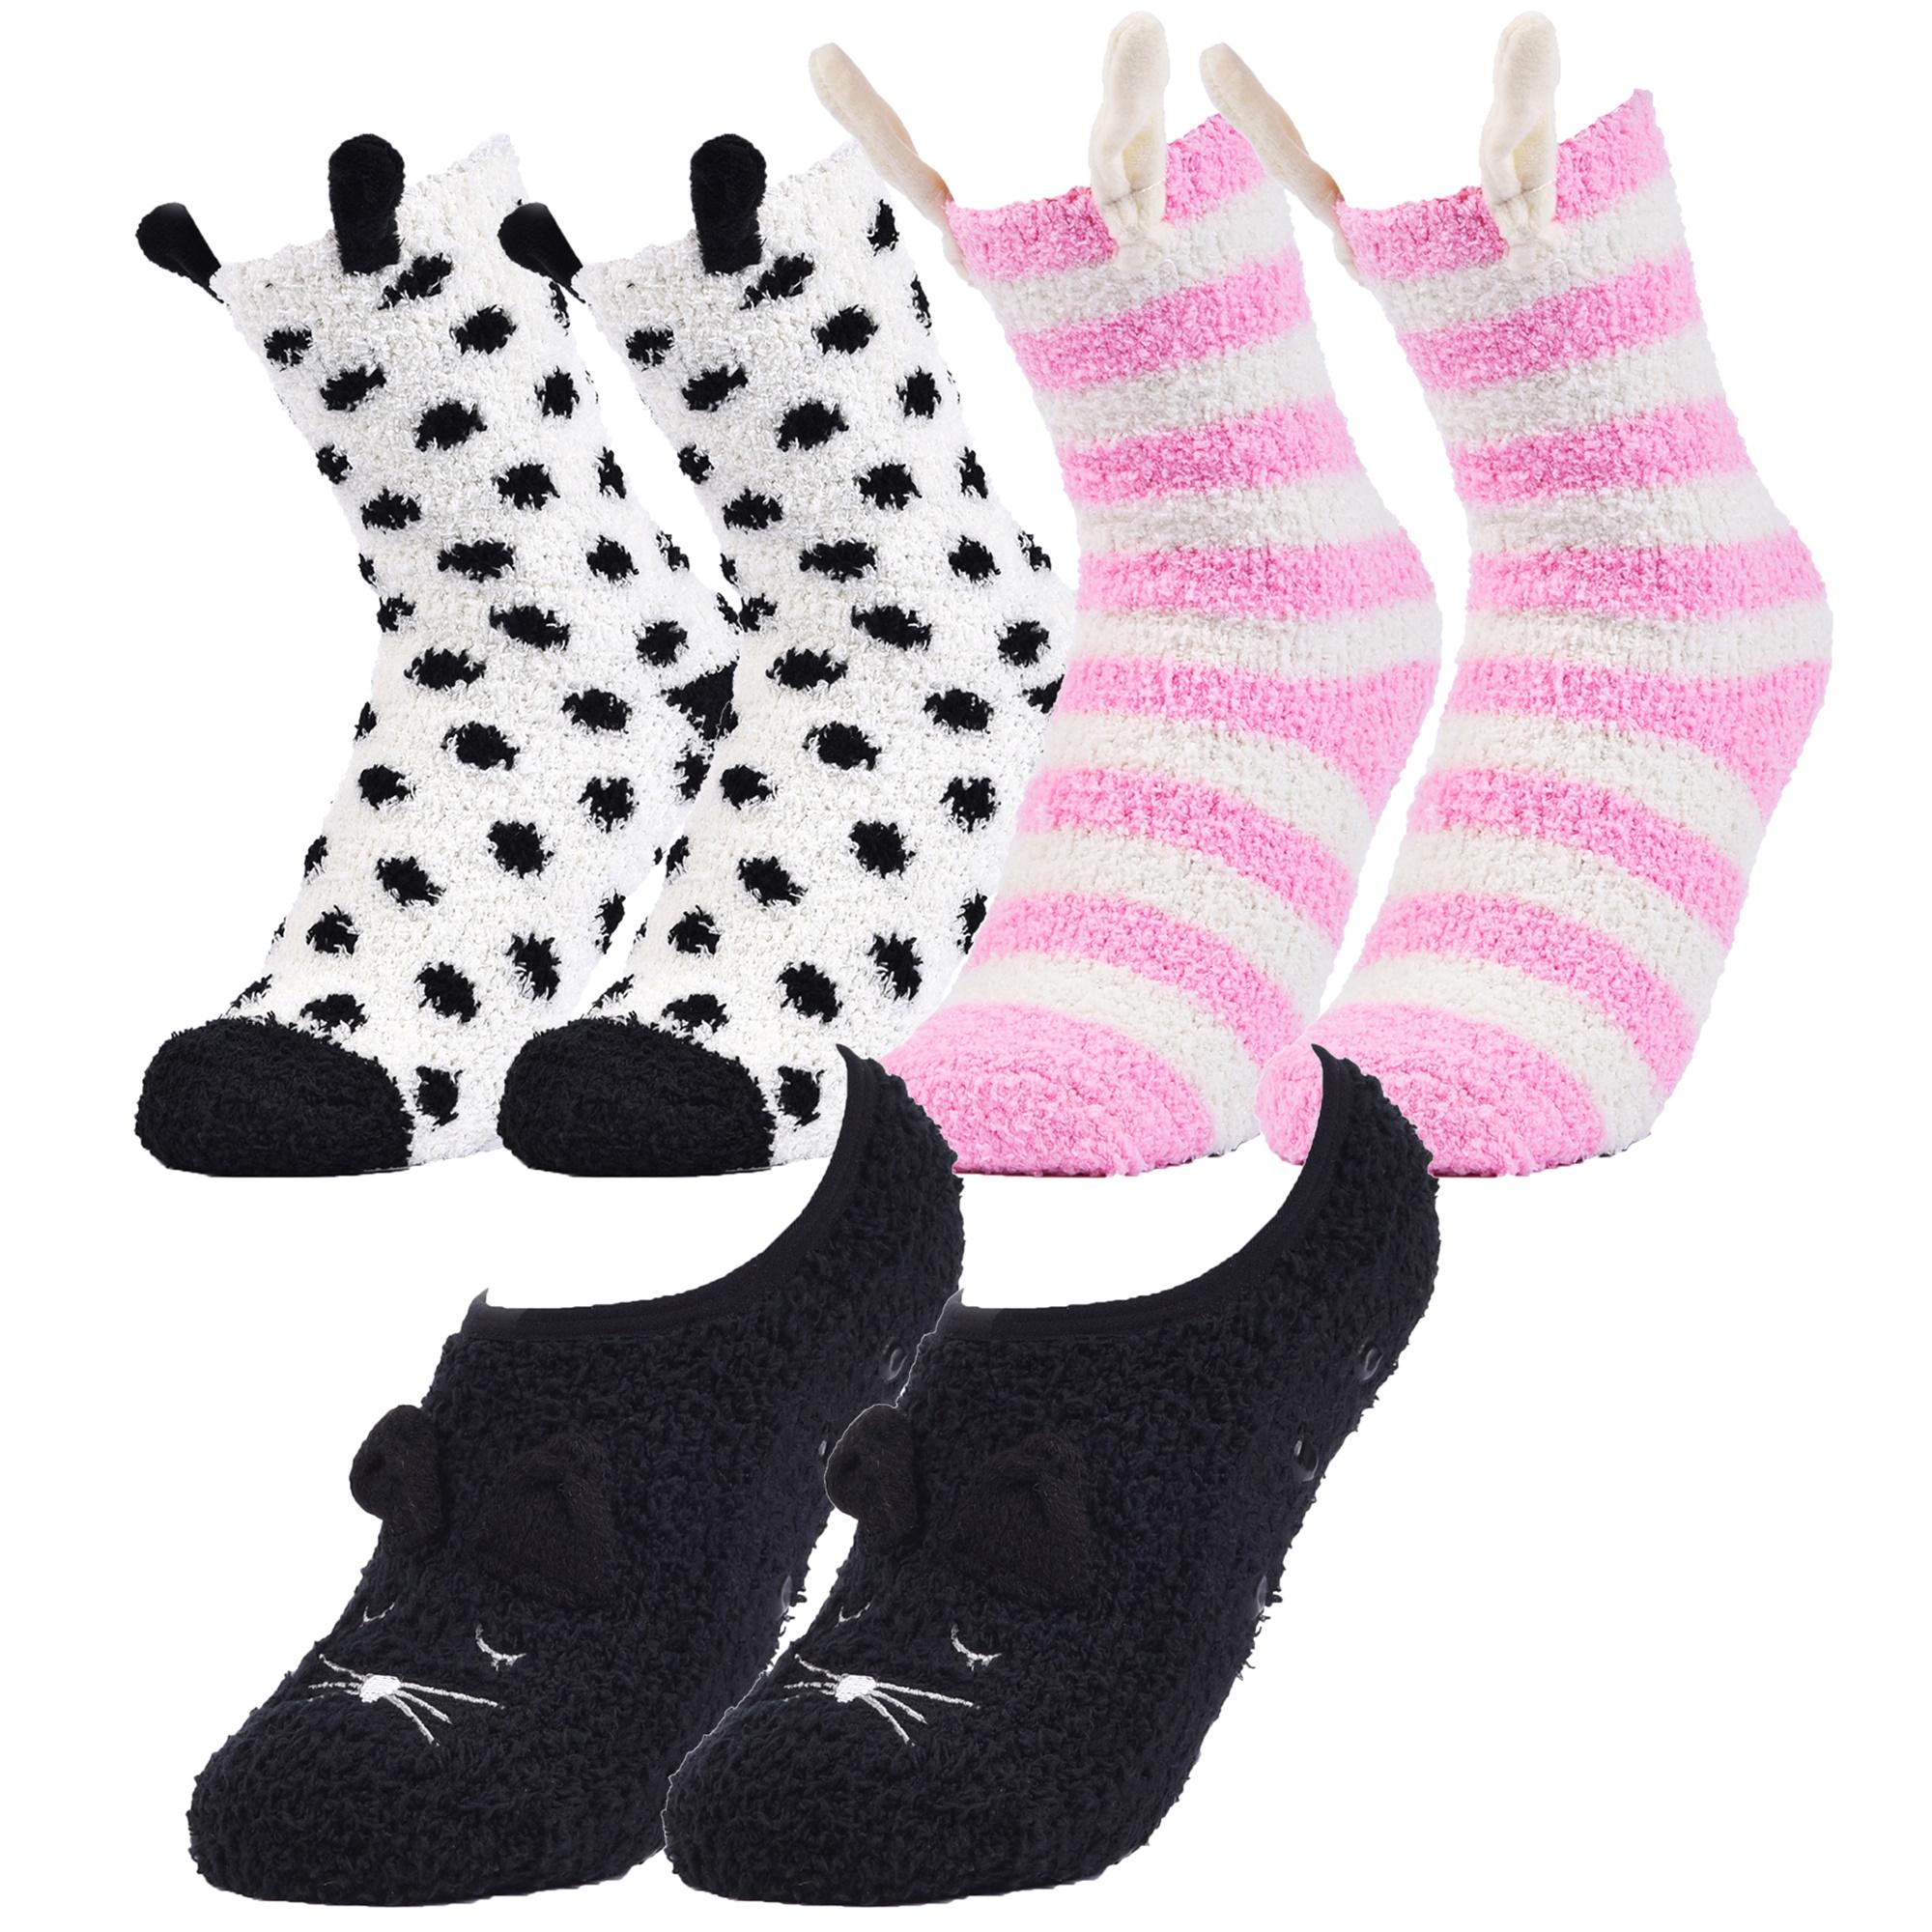 House Slippers warm winter socks Hand Knitting Winter Gift Accessory soft cozy socks Easter SALE White Hand Knit House Socks